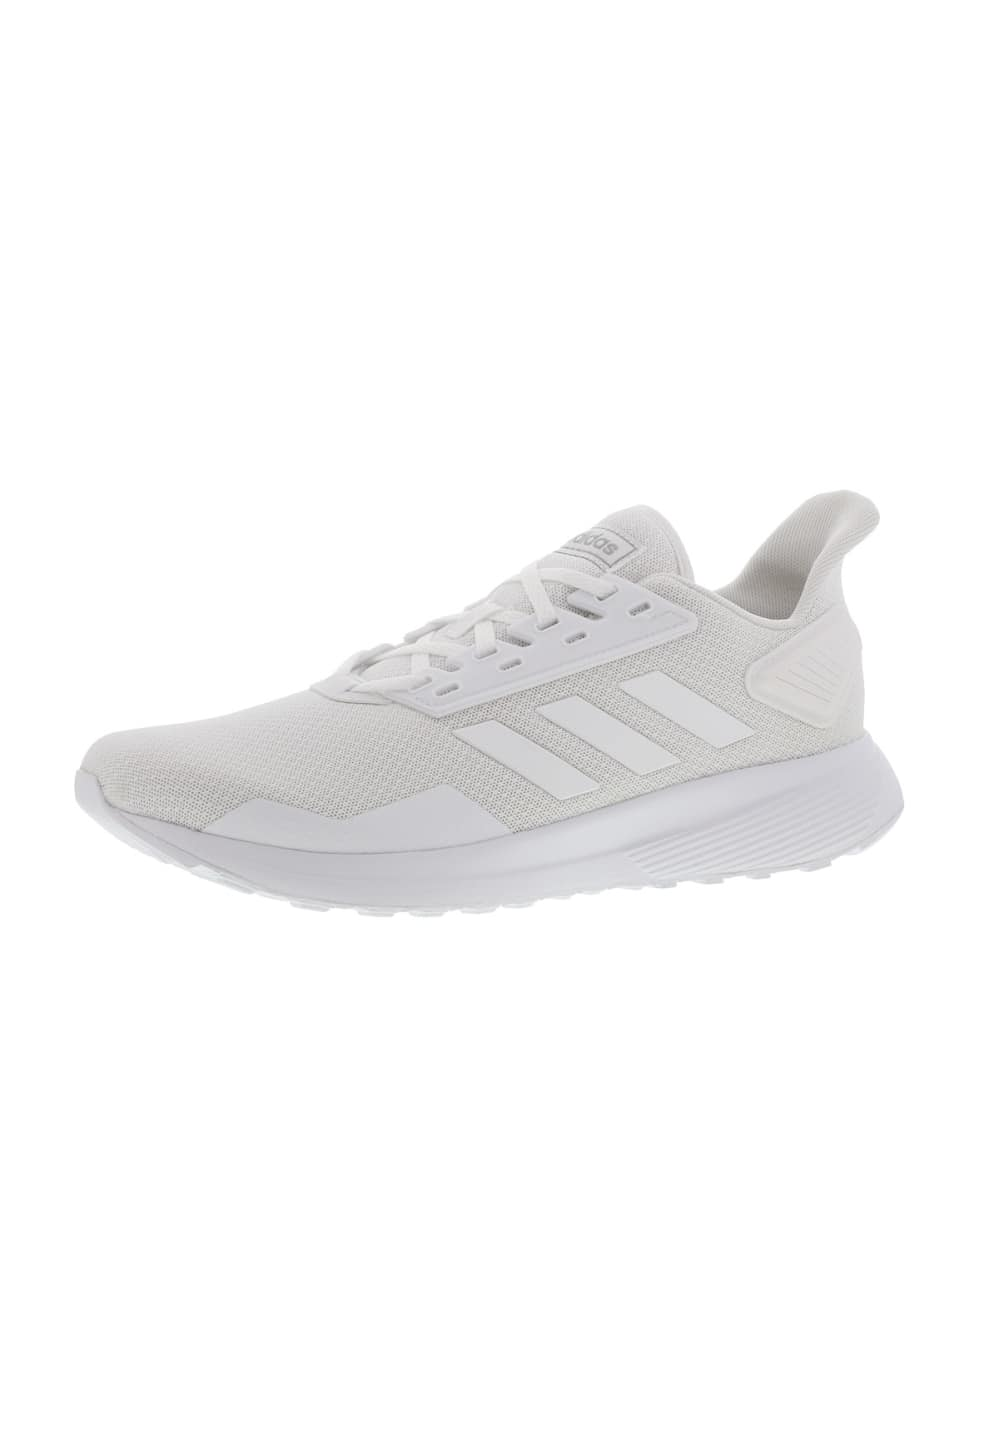 Pour Blanc 9 Homme Adidas Duramo Chaussures Running TcFKl1J